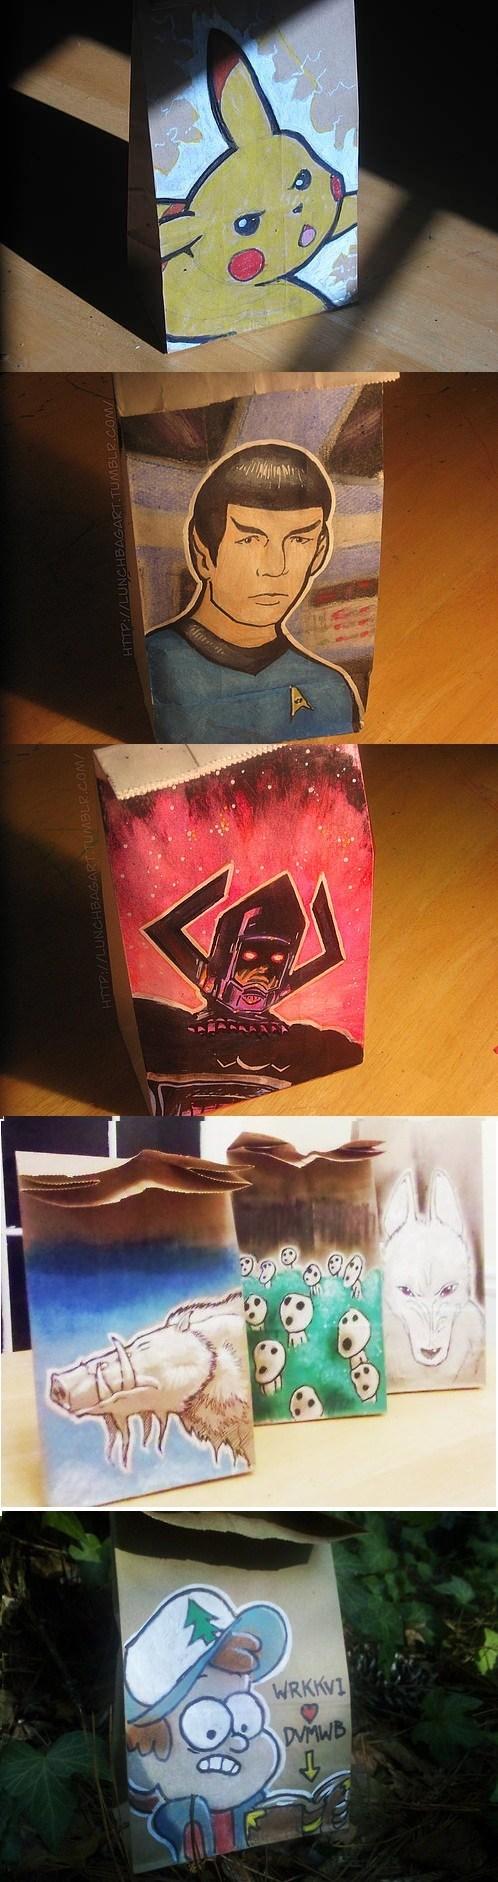 Pokémon art Fan Art gravity falls studio ghibli superheroes Star Trek - 6997584896